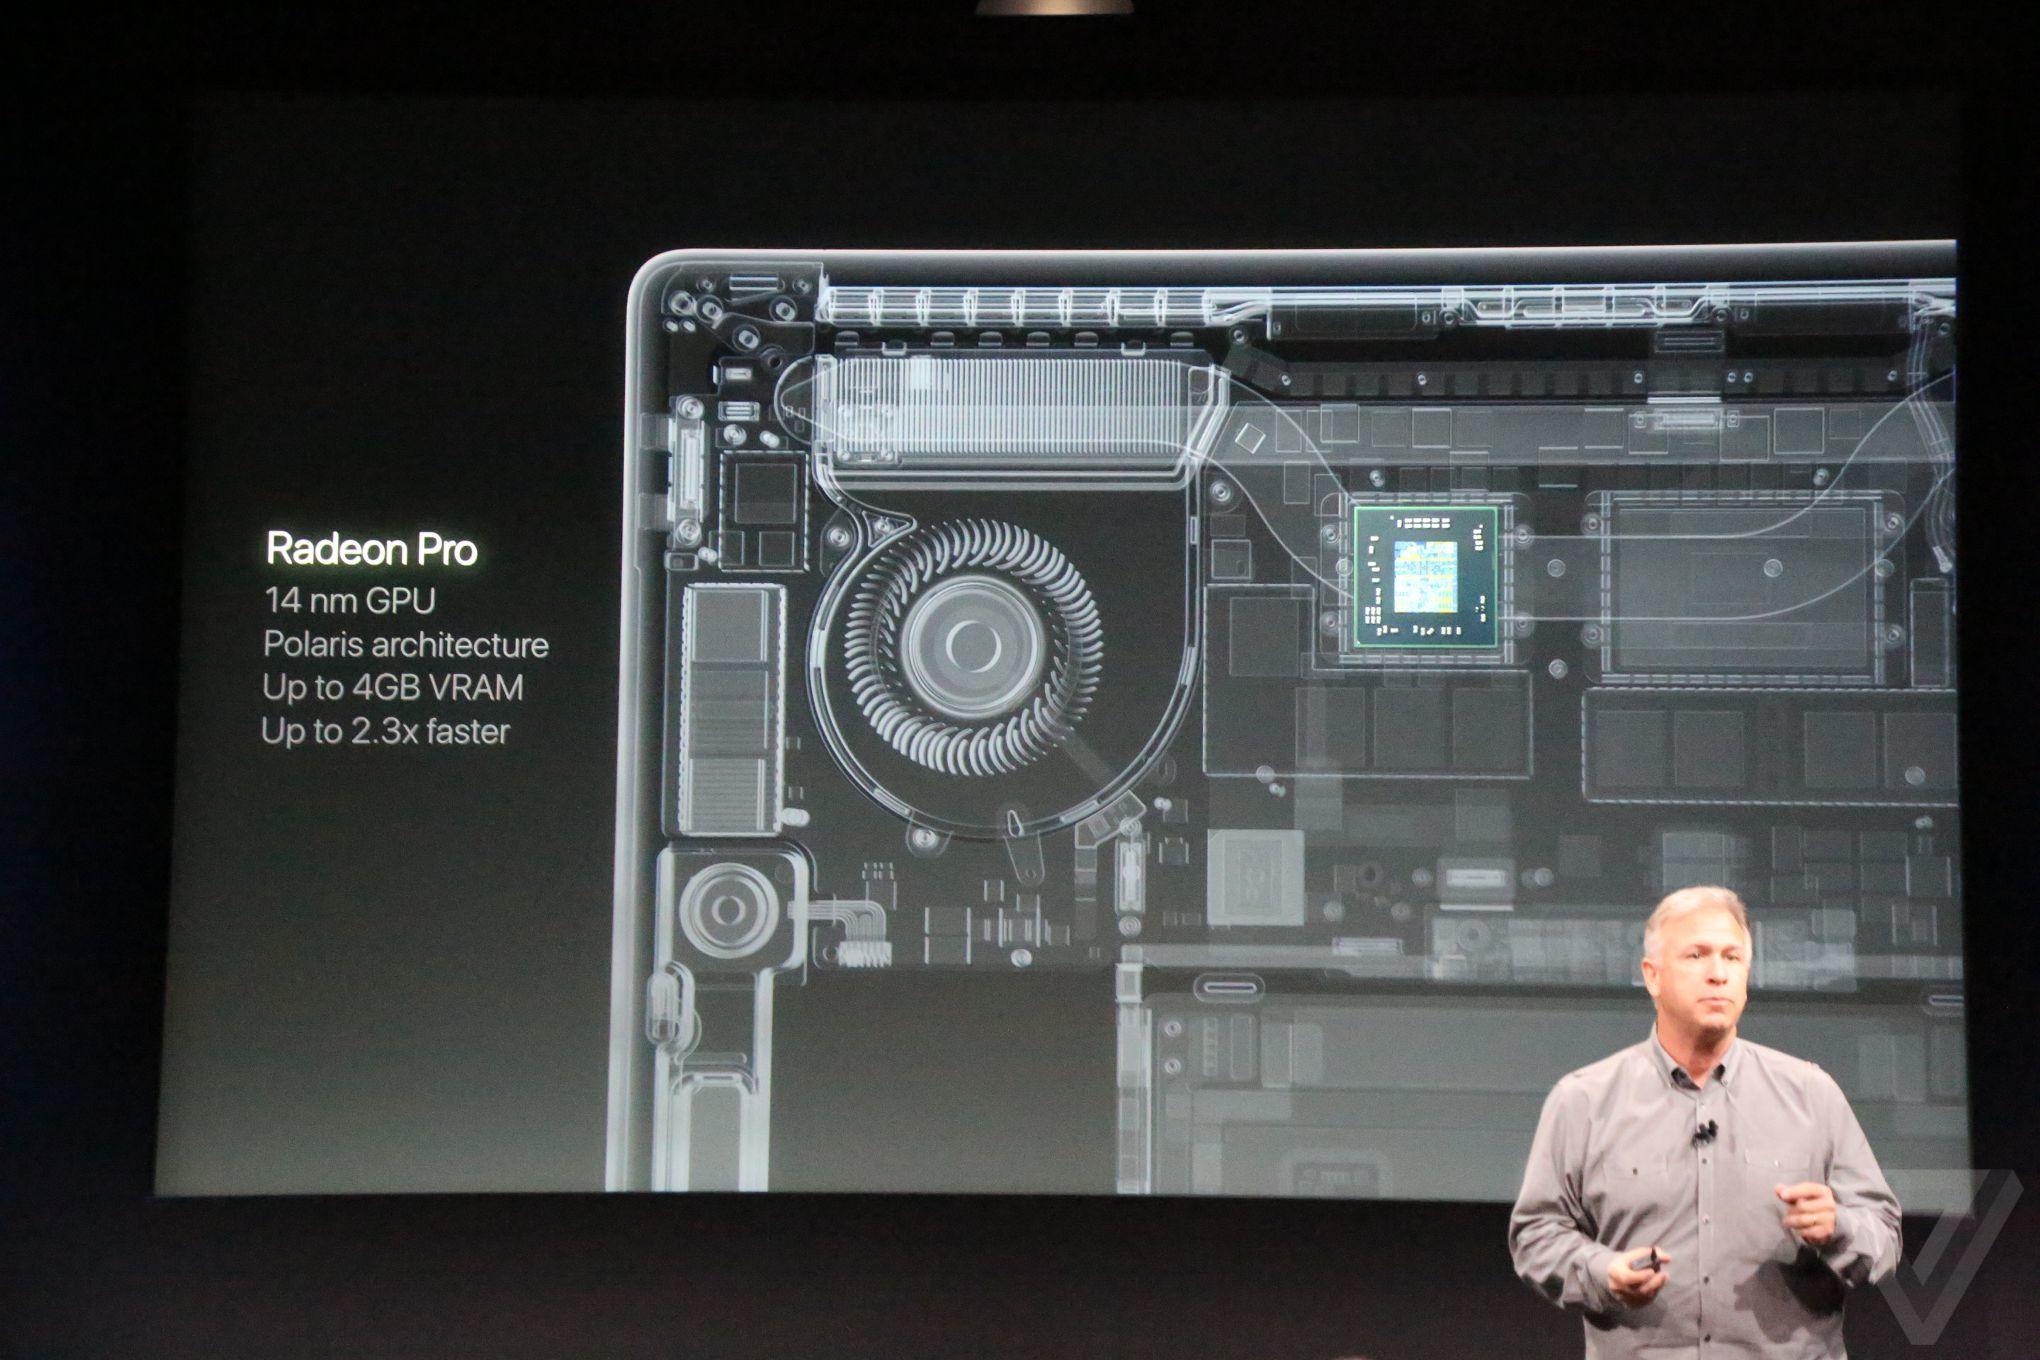 New Macbook Pros using Radeon Pro graphics (Polaris